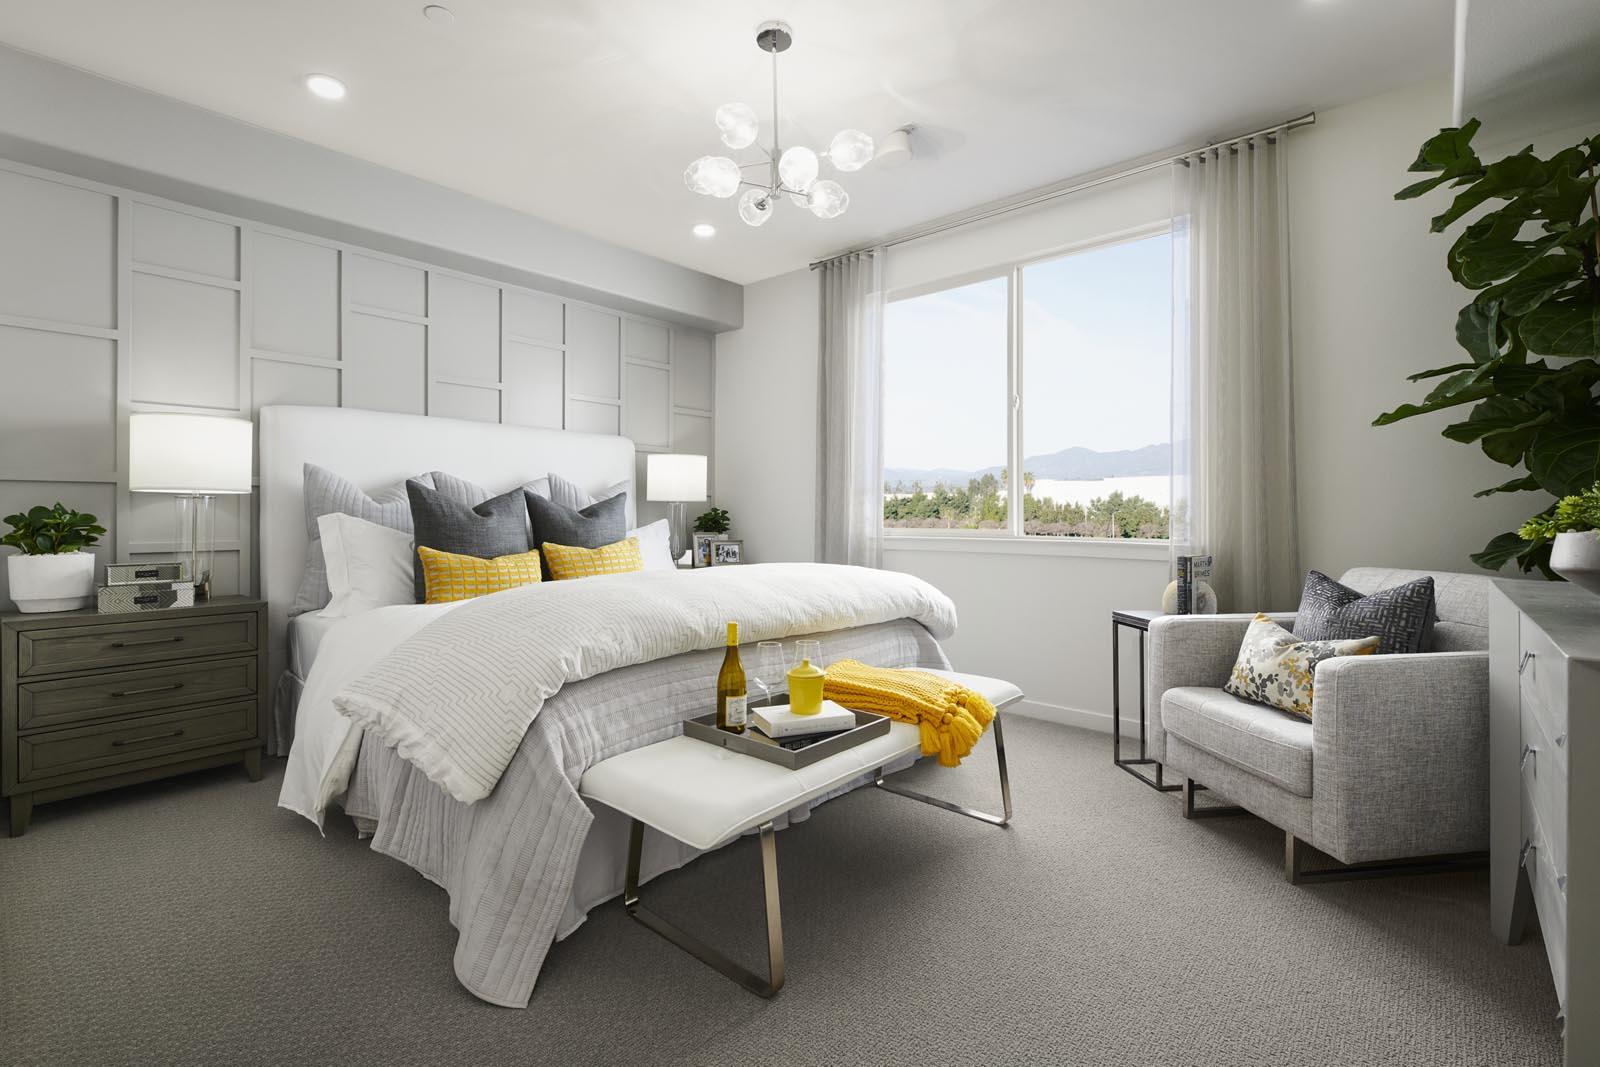 Master Bedroom | Residence 1 | Aspire | New Homes in Rancho Cucamonga, CA | Van Daele Homes